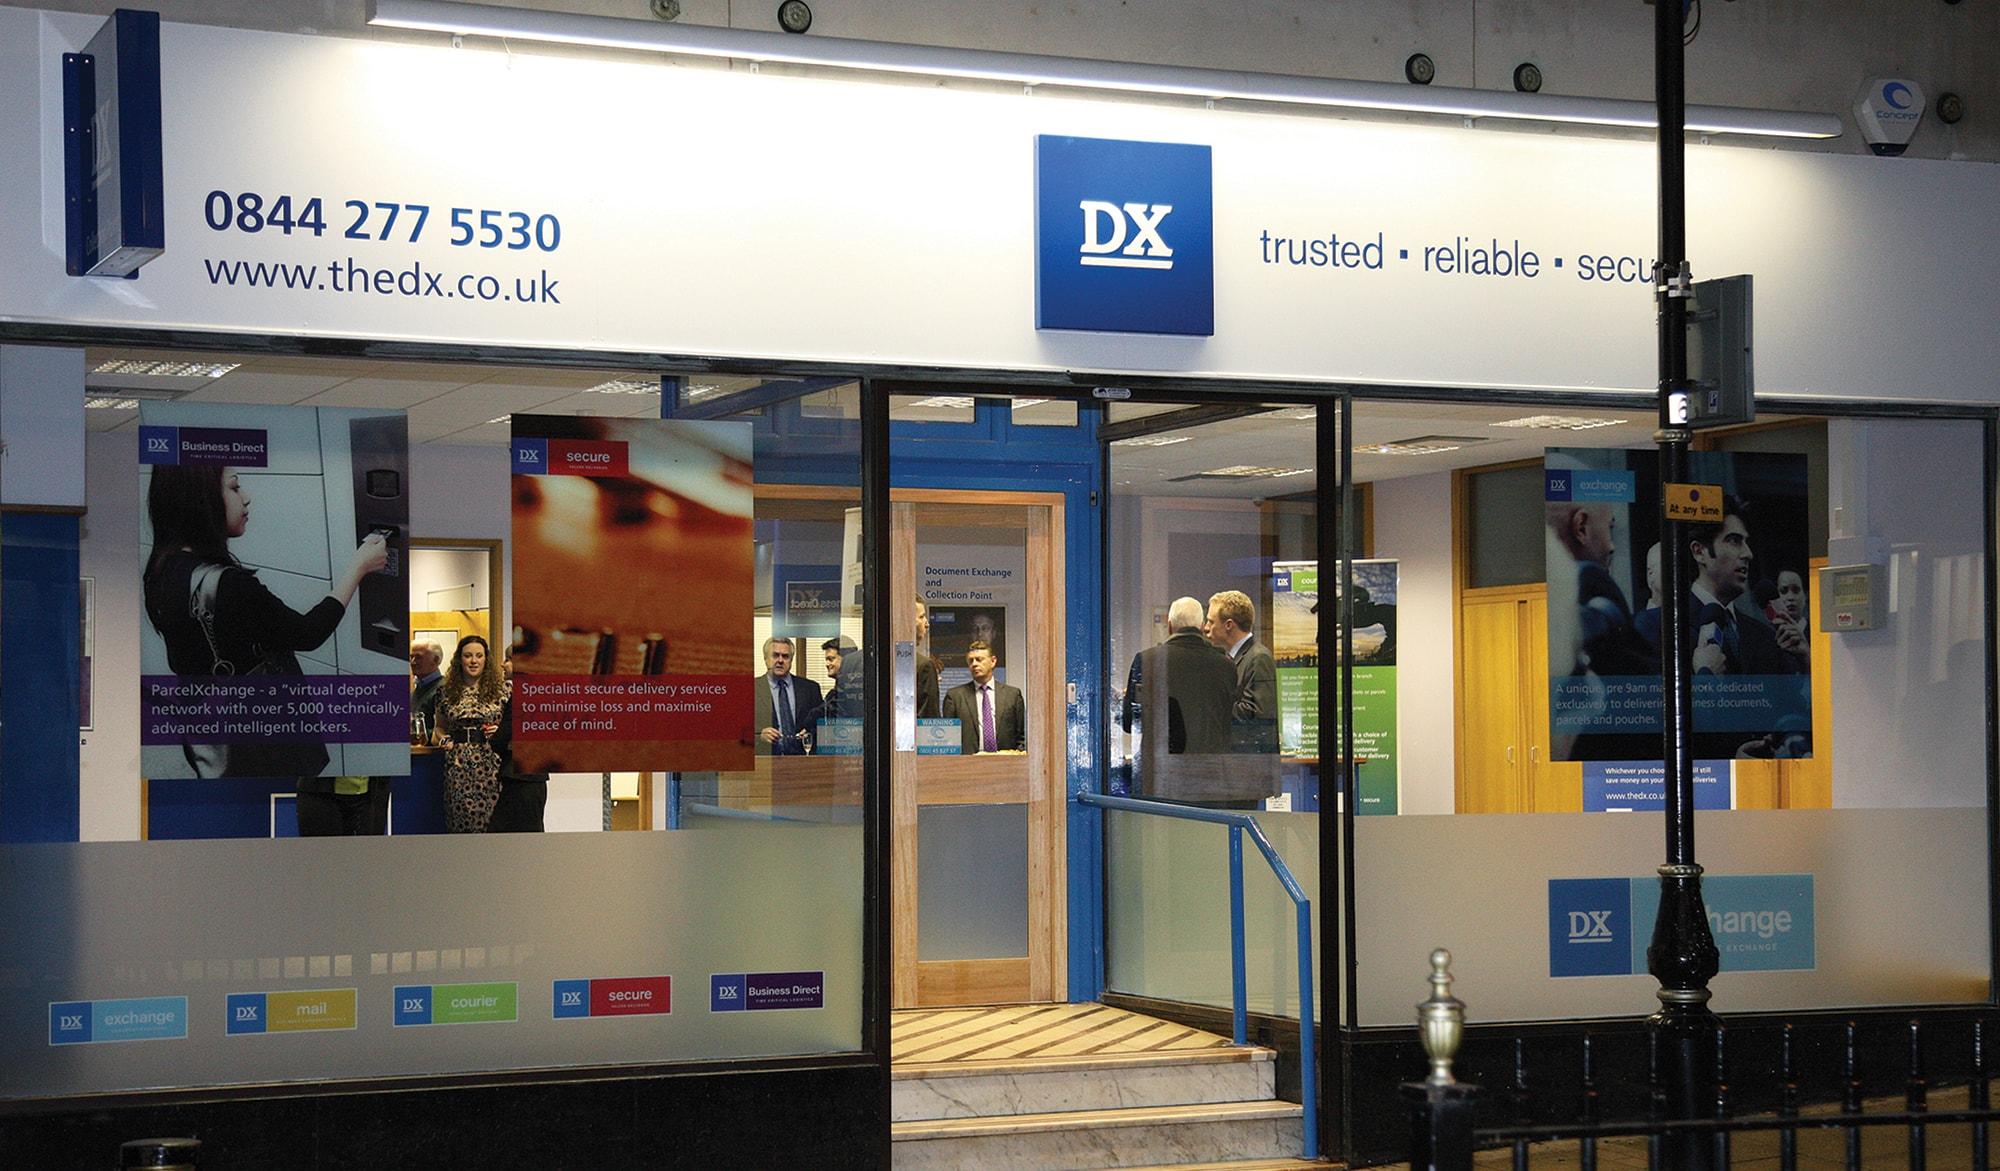 DX branch signage